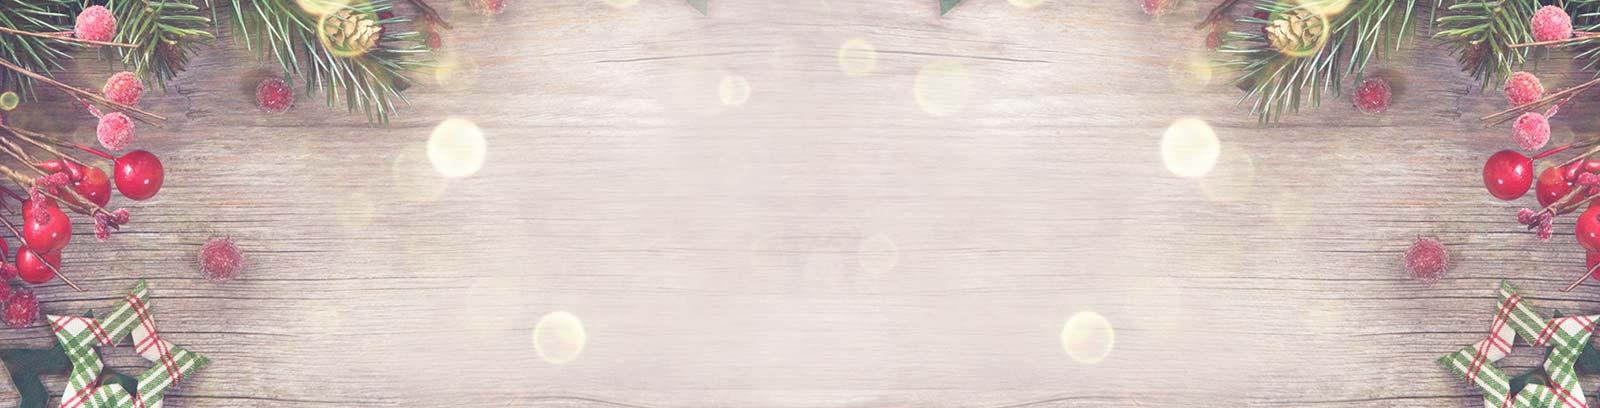 Games banner image